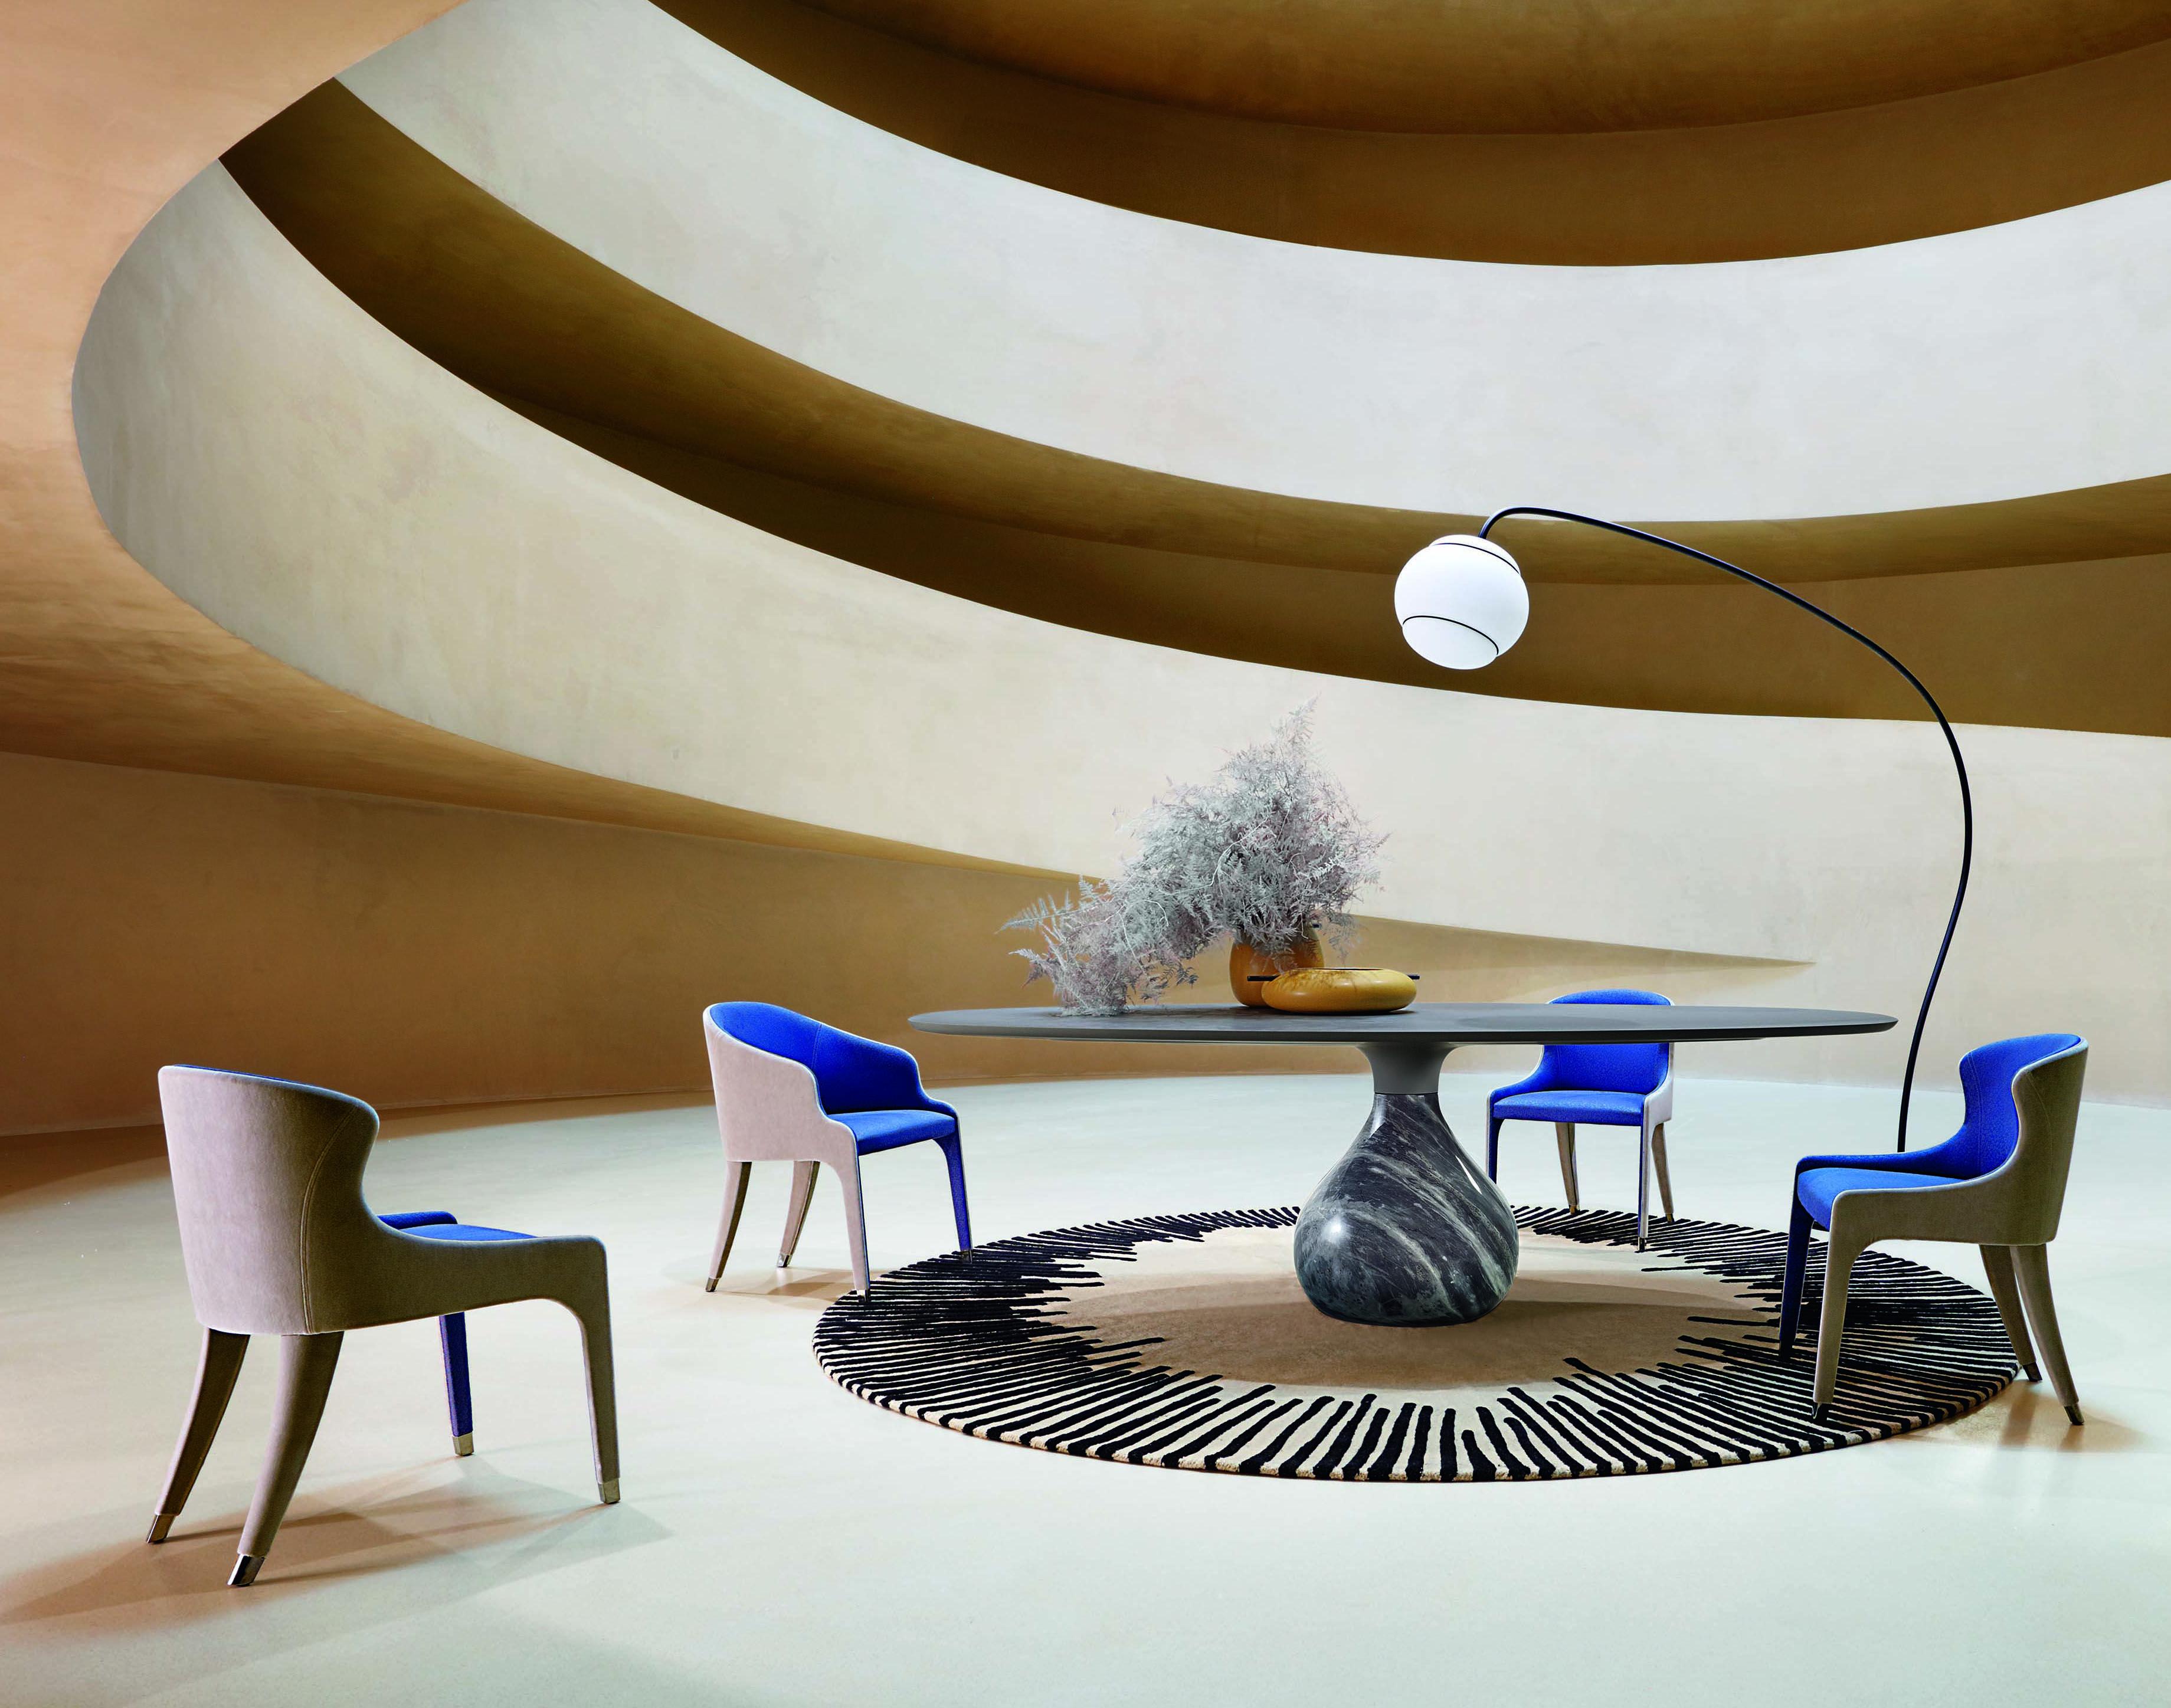 Roche Bobois l Aqua Dining Table l Designed by Fabrice